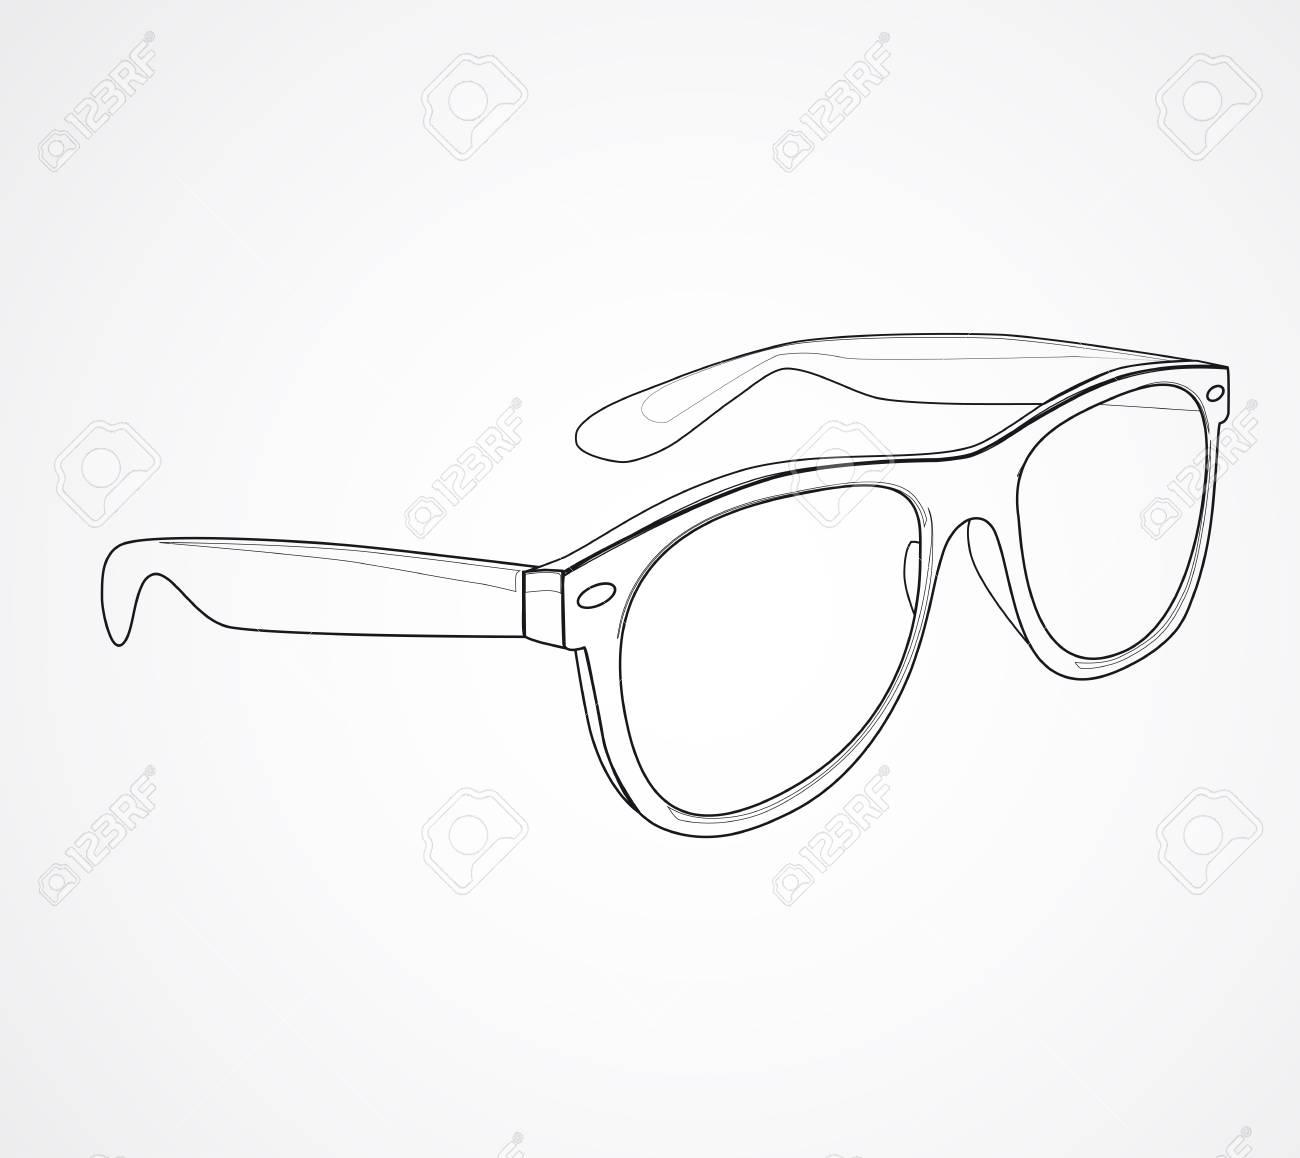 Sunglasses isolated illustration - 31104679